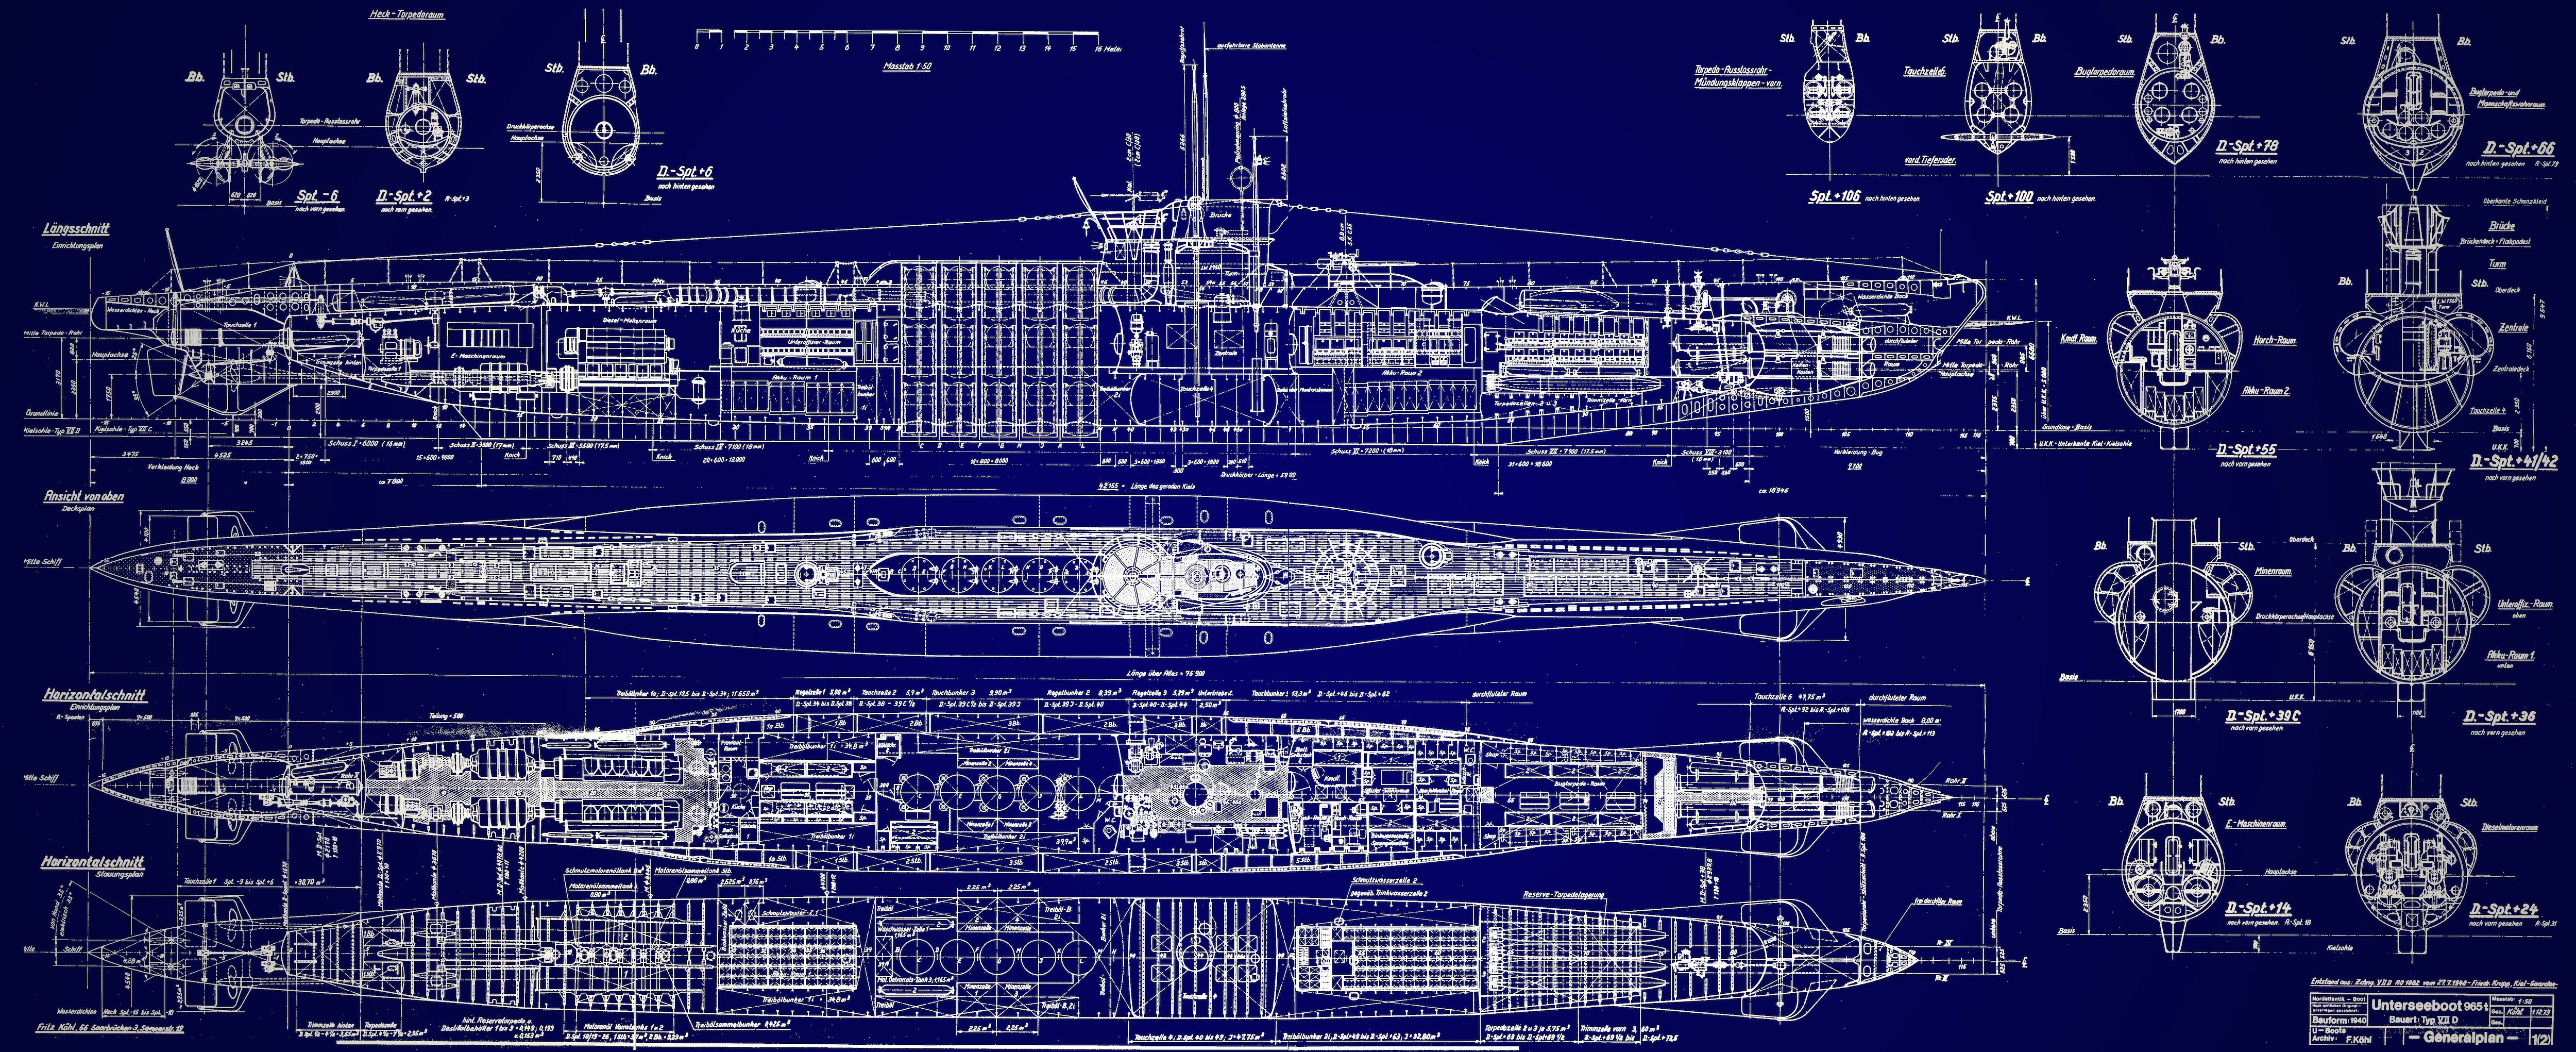 """Tugs of the fleet old tugs""  161217022341833055"